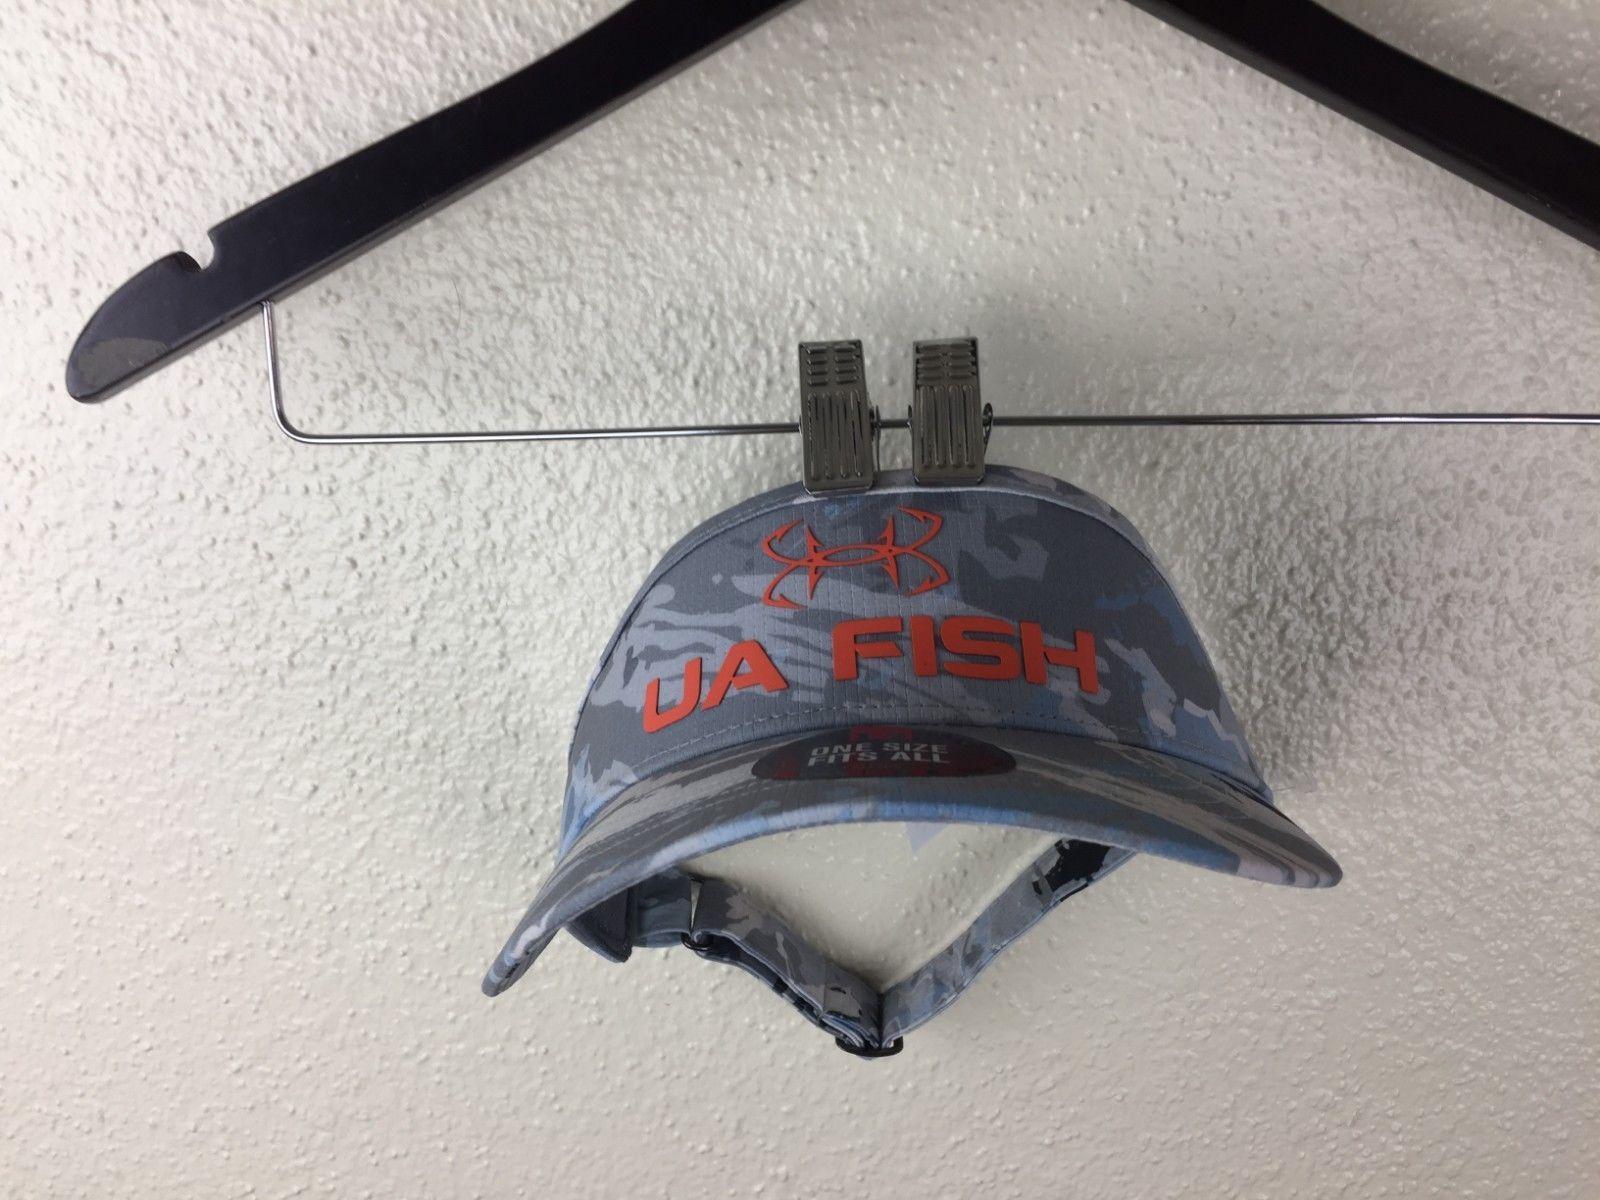 0c71ad16bac Under Armour Men s Adjustable UA FISH Visor and 50 similar items. 57